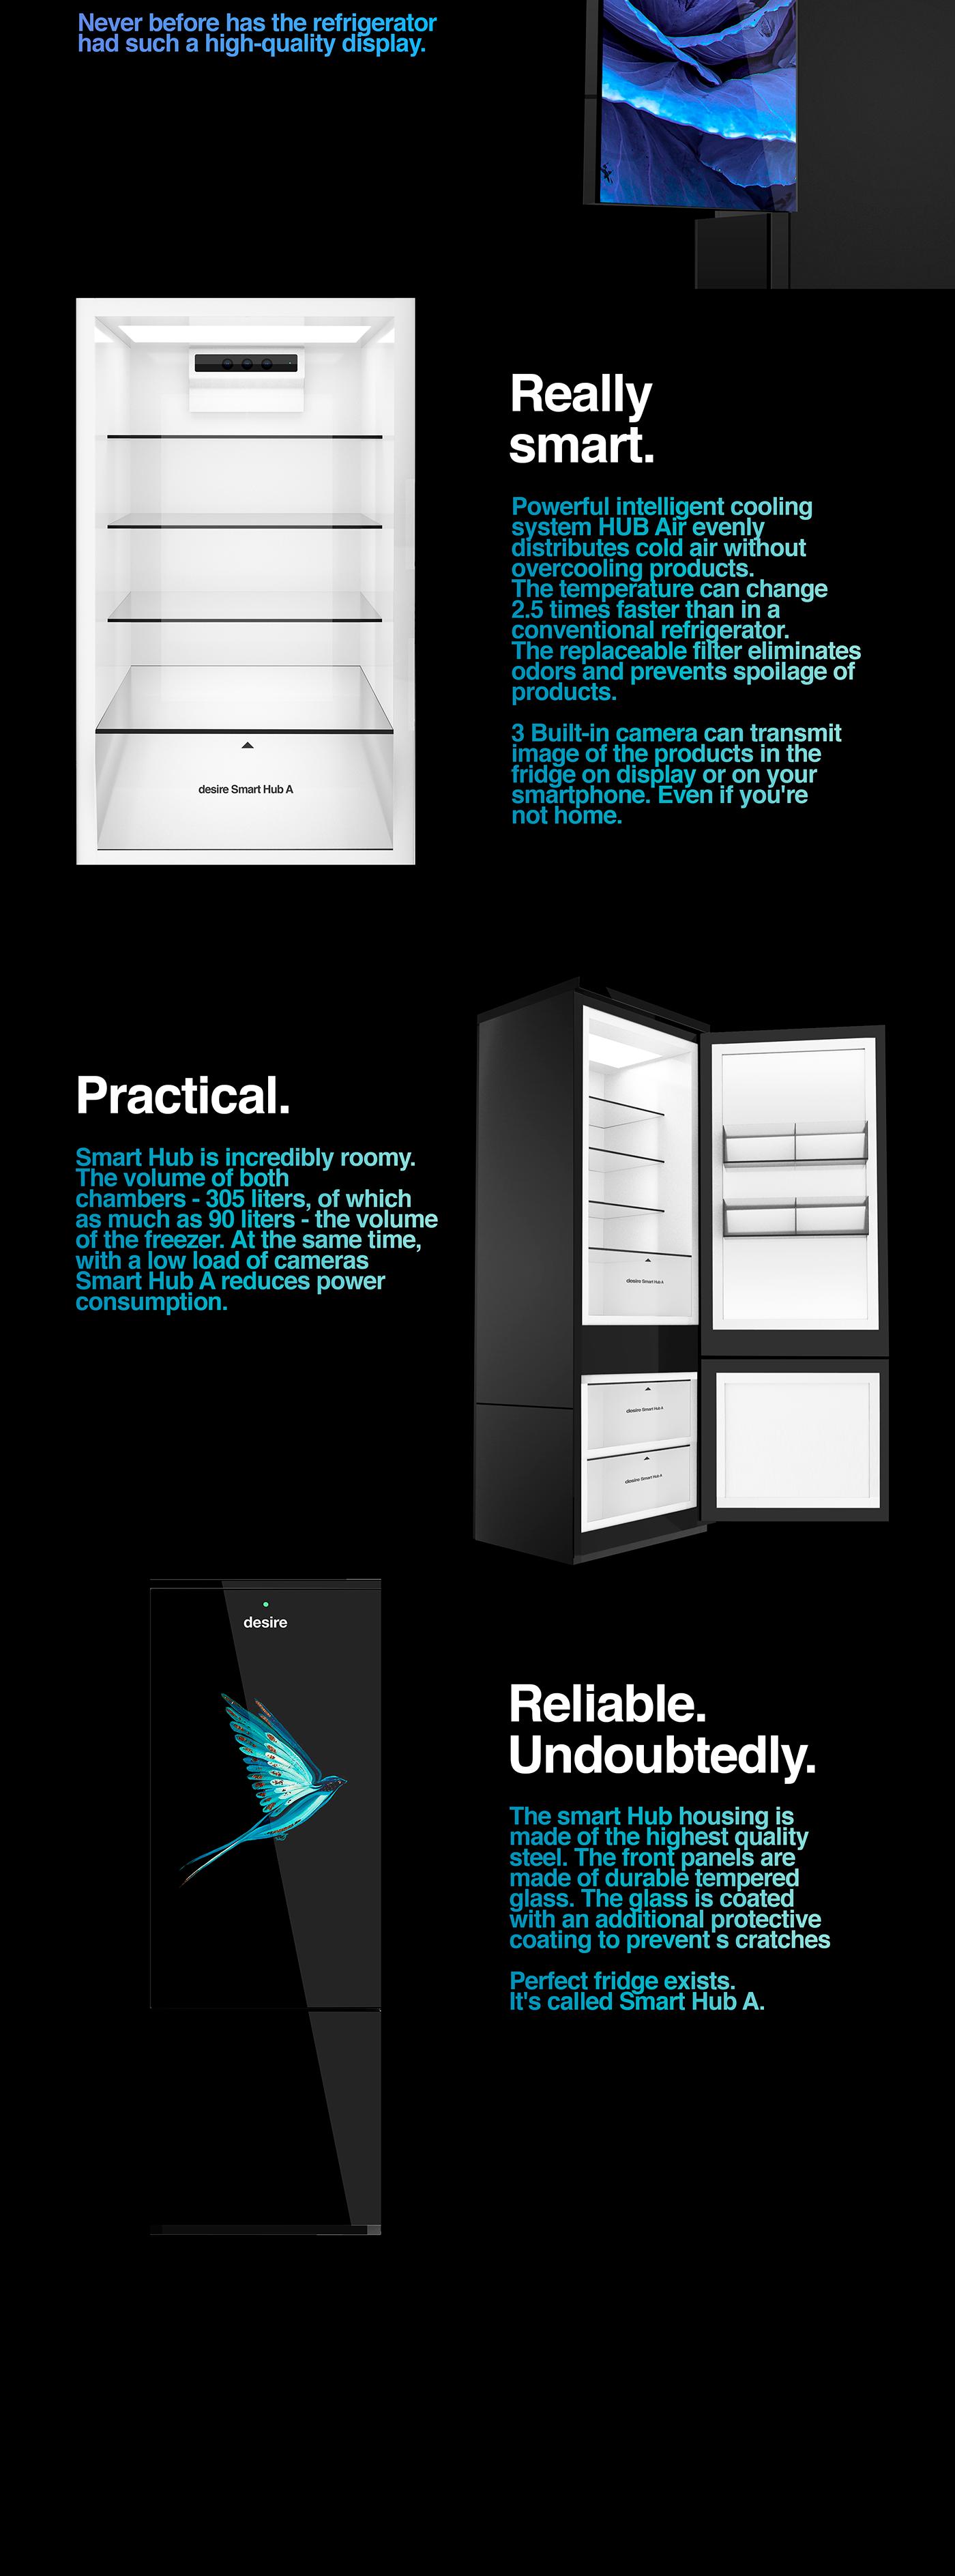 product refrigerator fridge Metall glass future minimal Smart